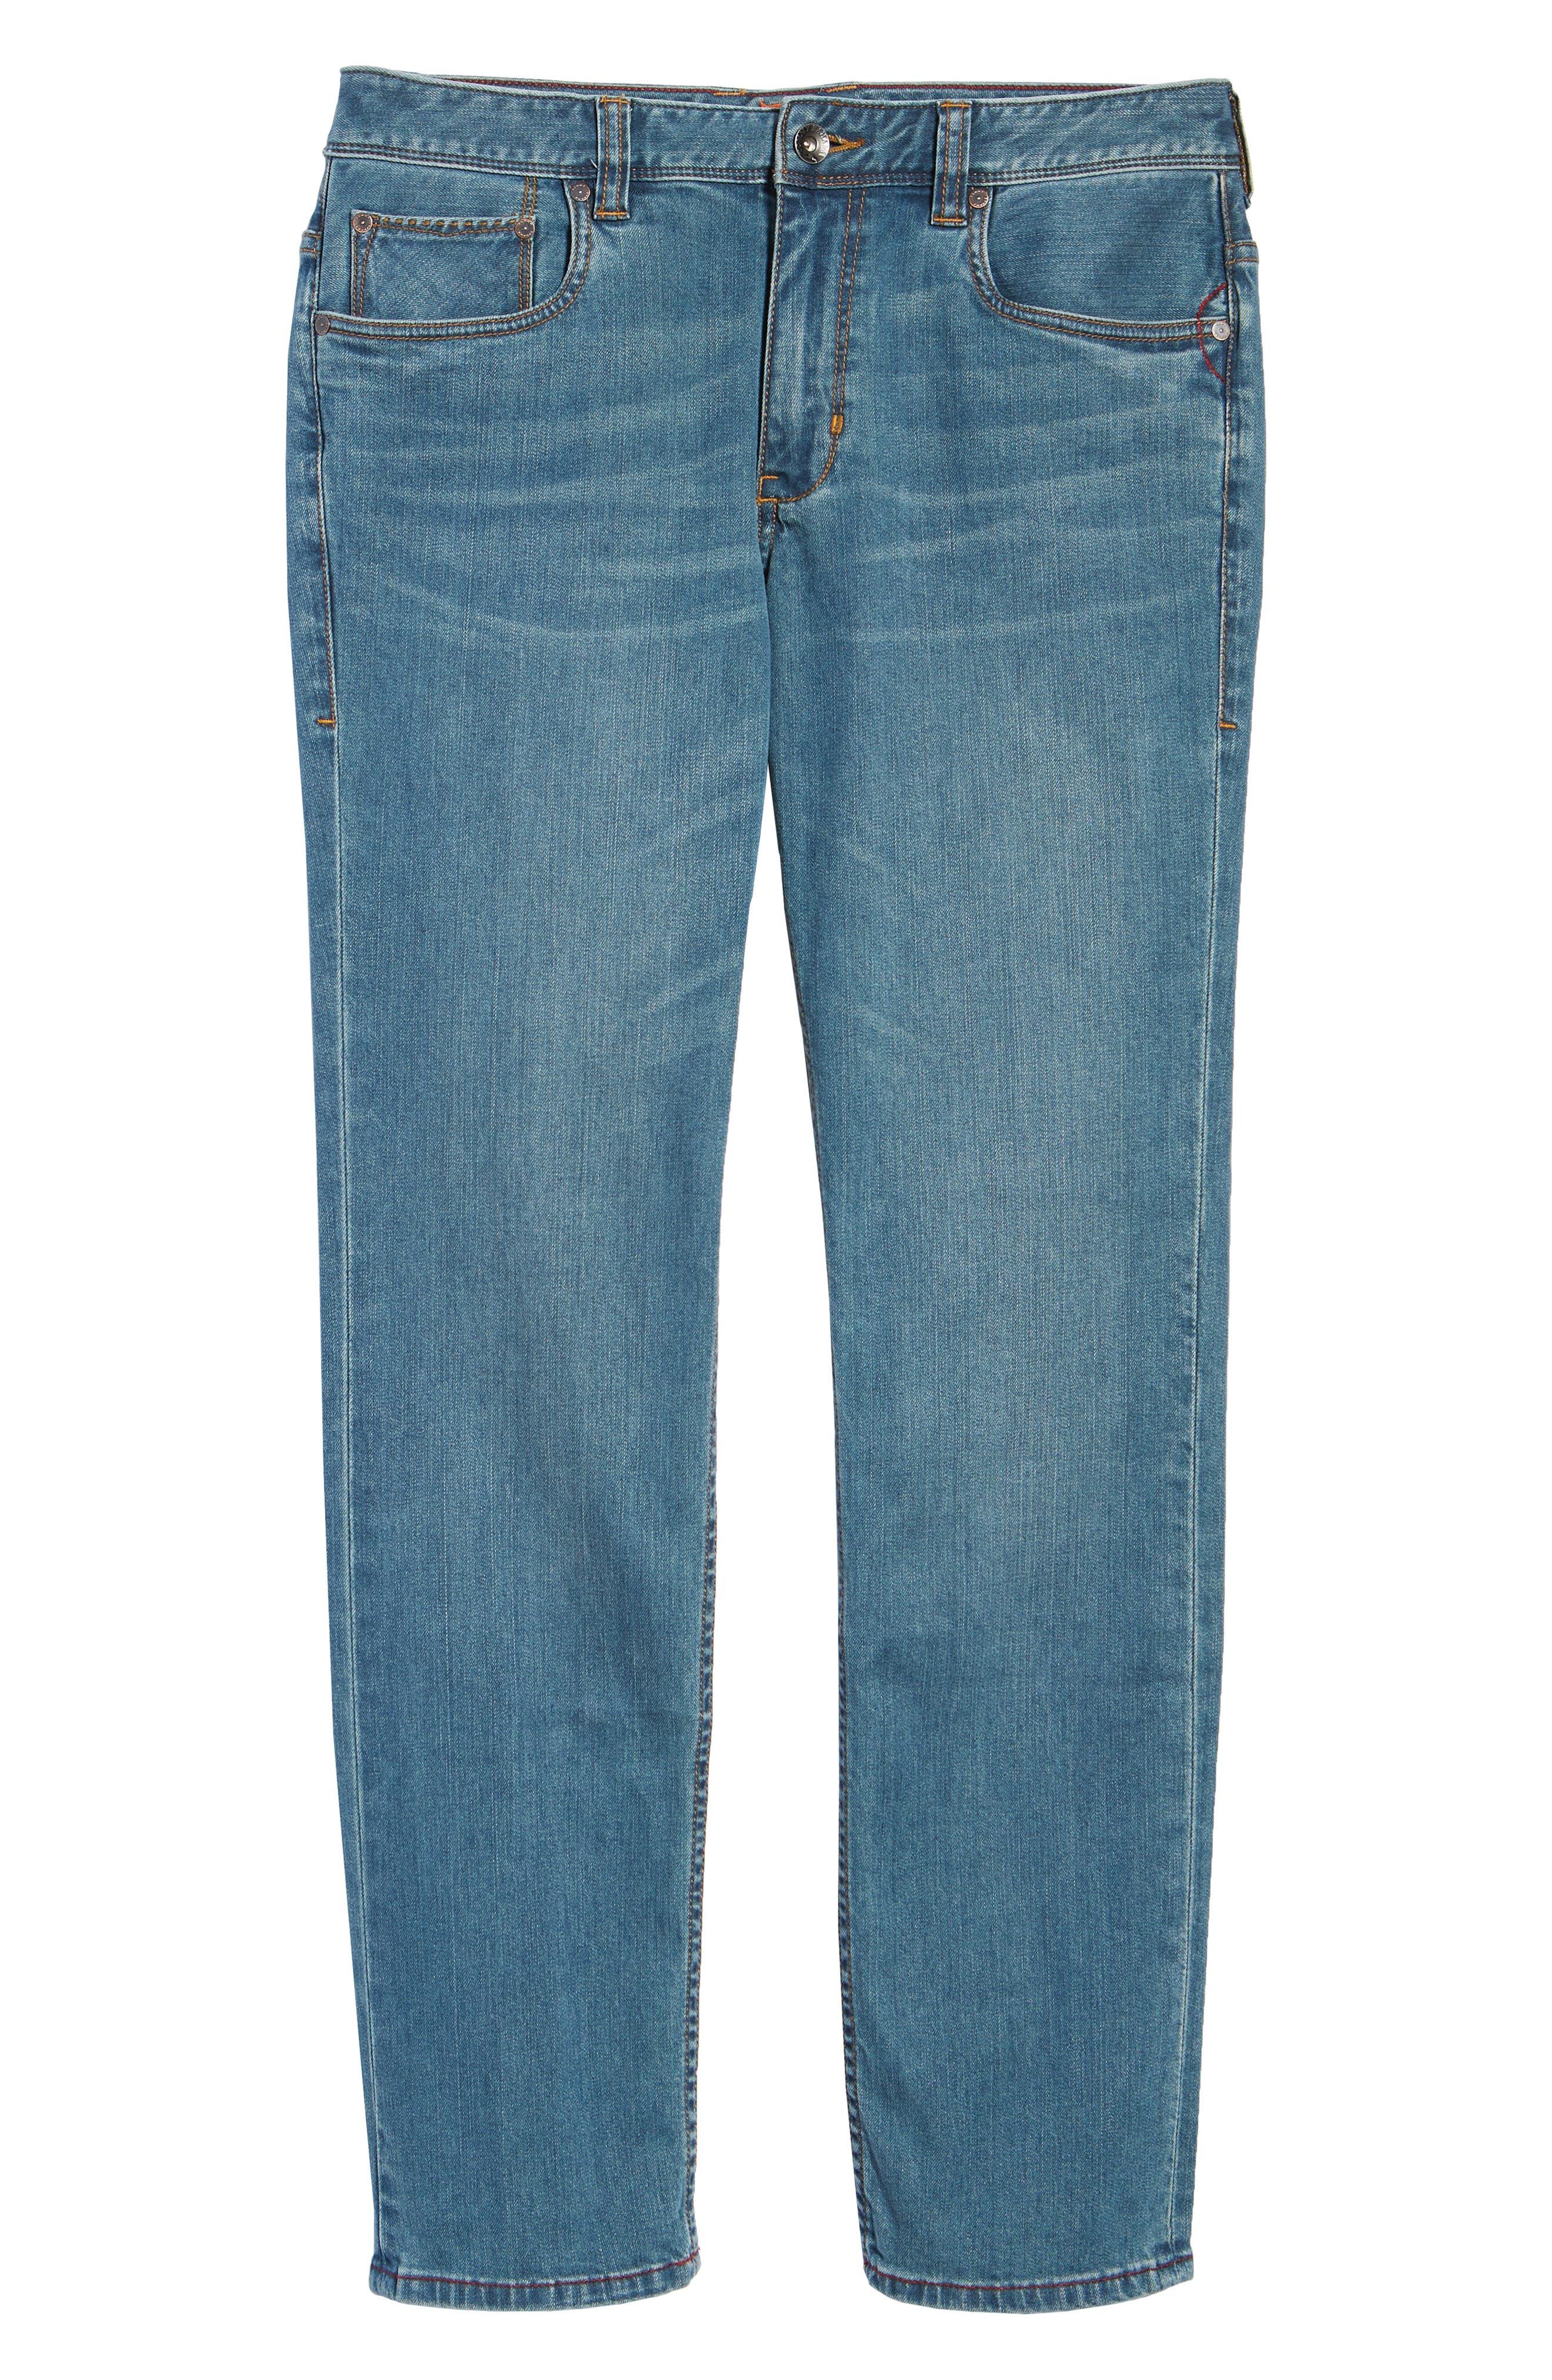 Vintage Fit Jeans,                             Alternate thumbnail 6, color,                             Vintage Wash